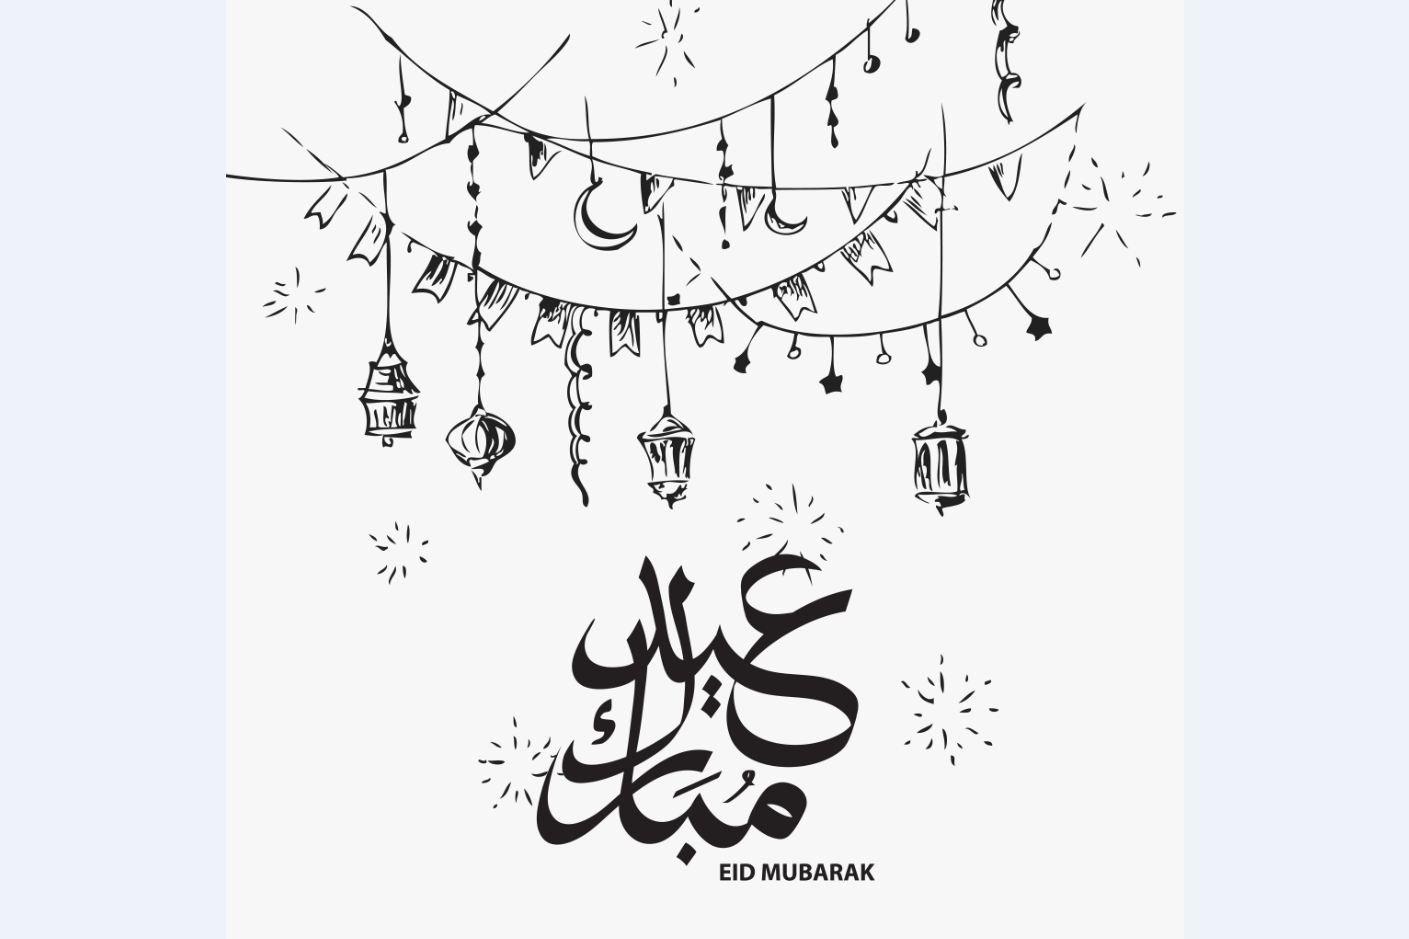 Eid Mubarak Photos Graphics Fonts Themes Templates Creative Market